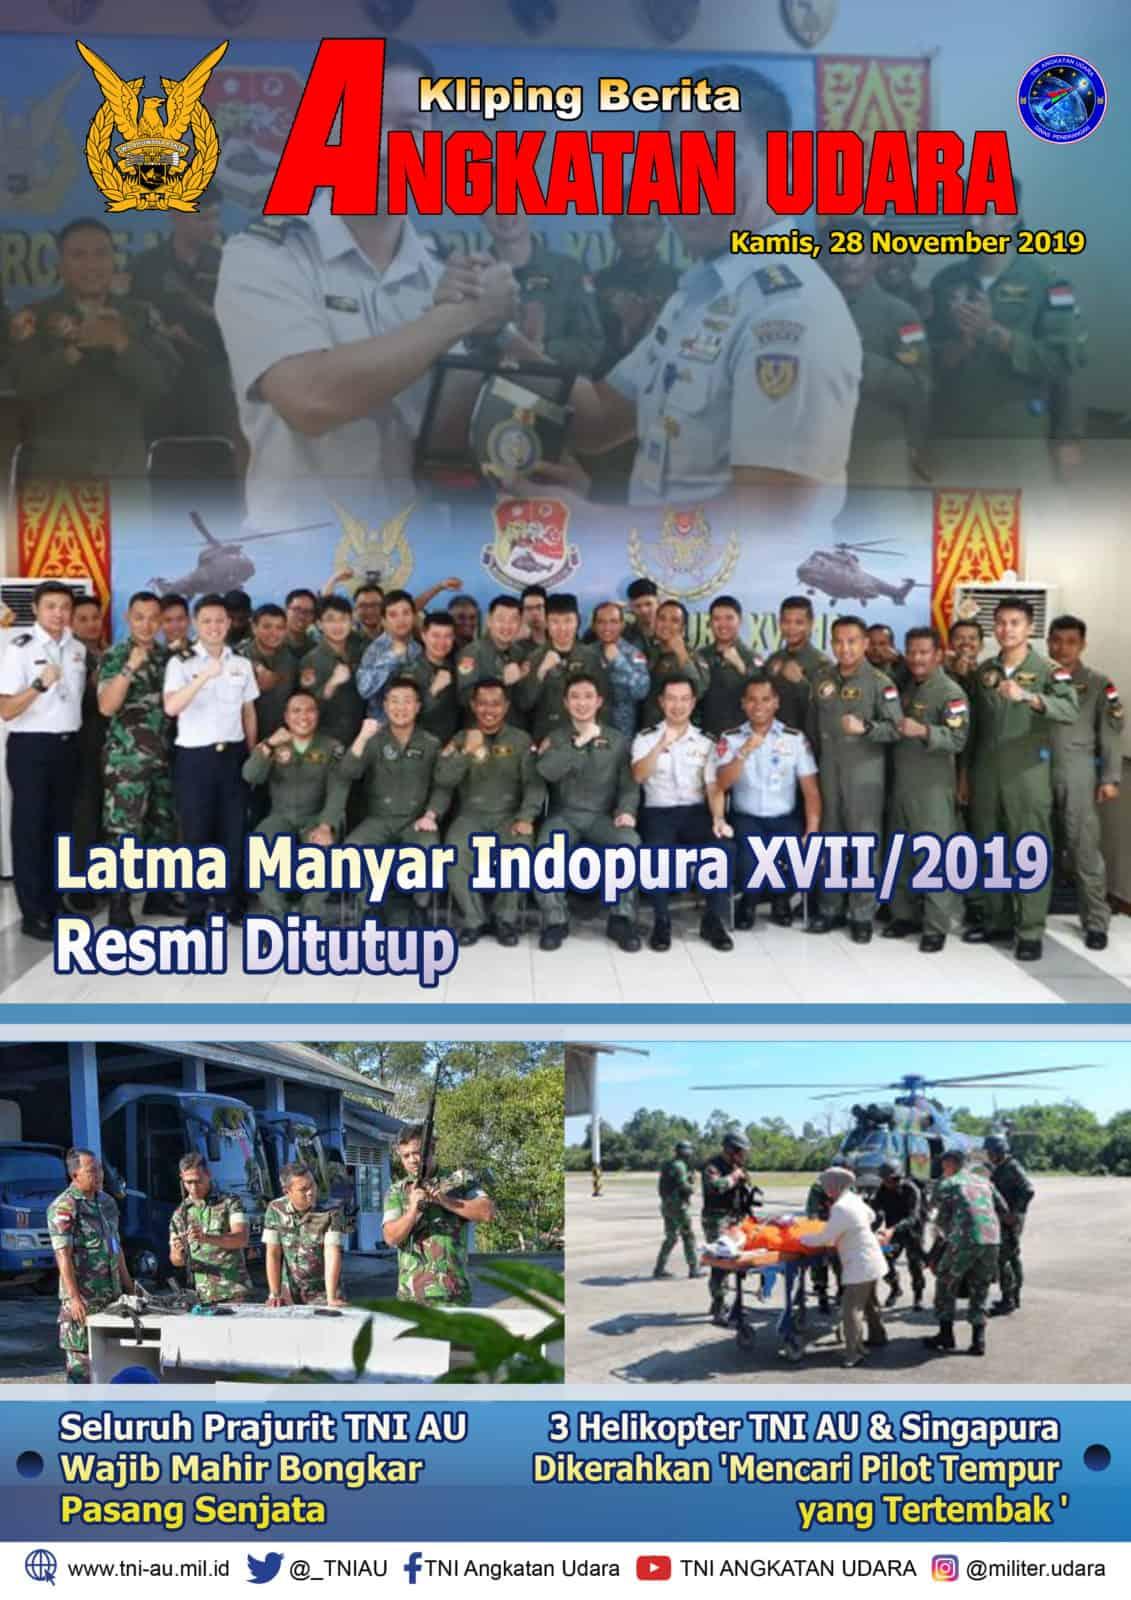 Kliping Berita Media 28 November 2019